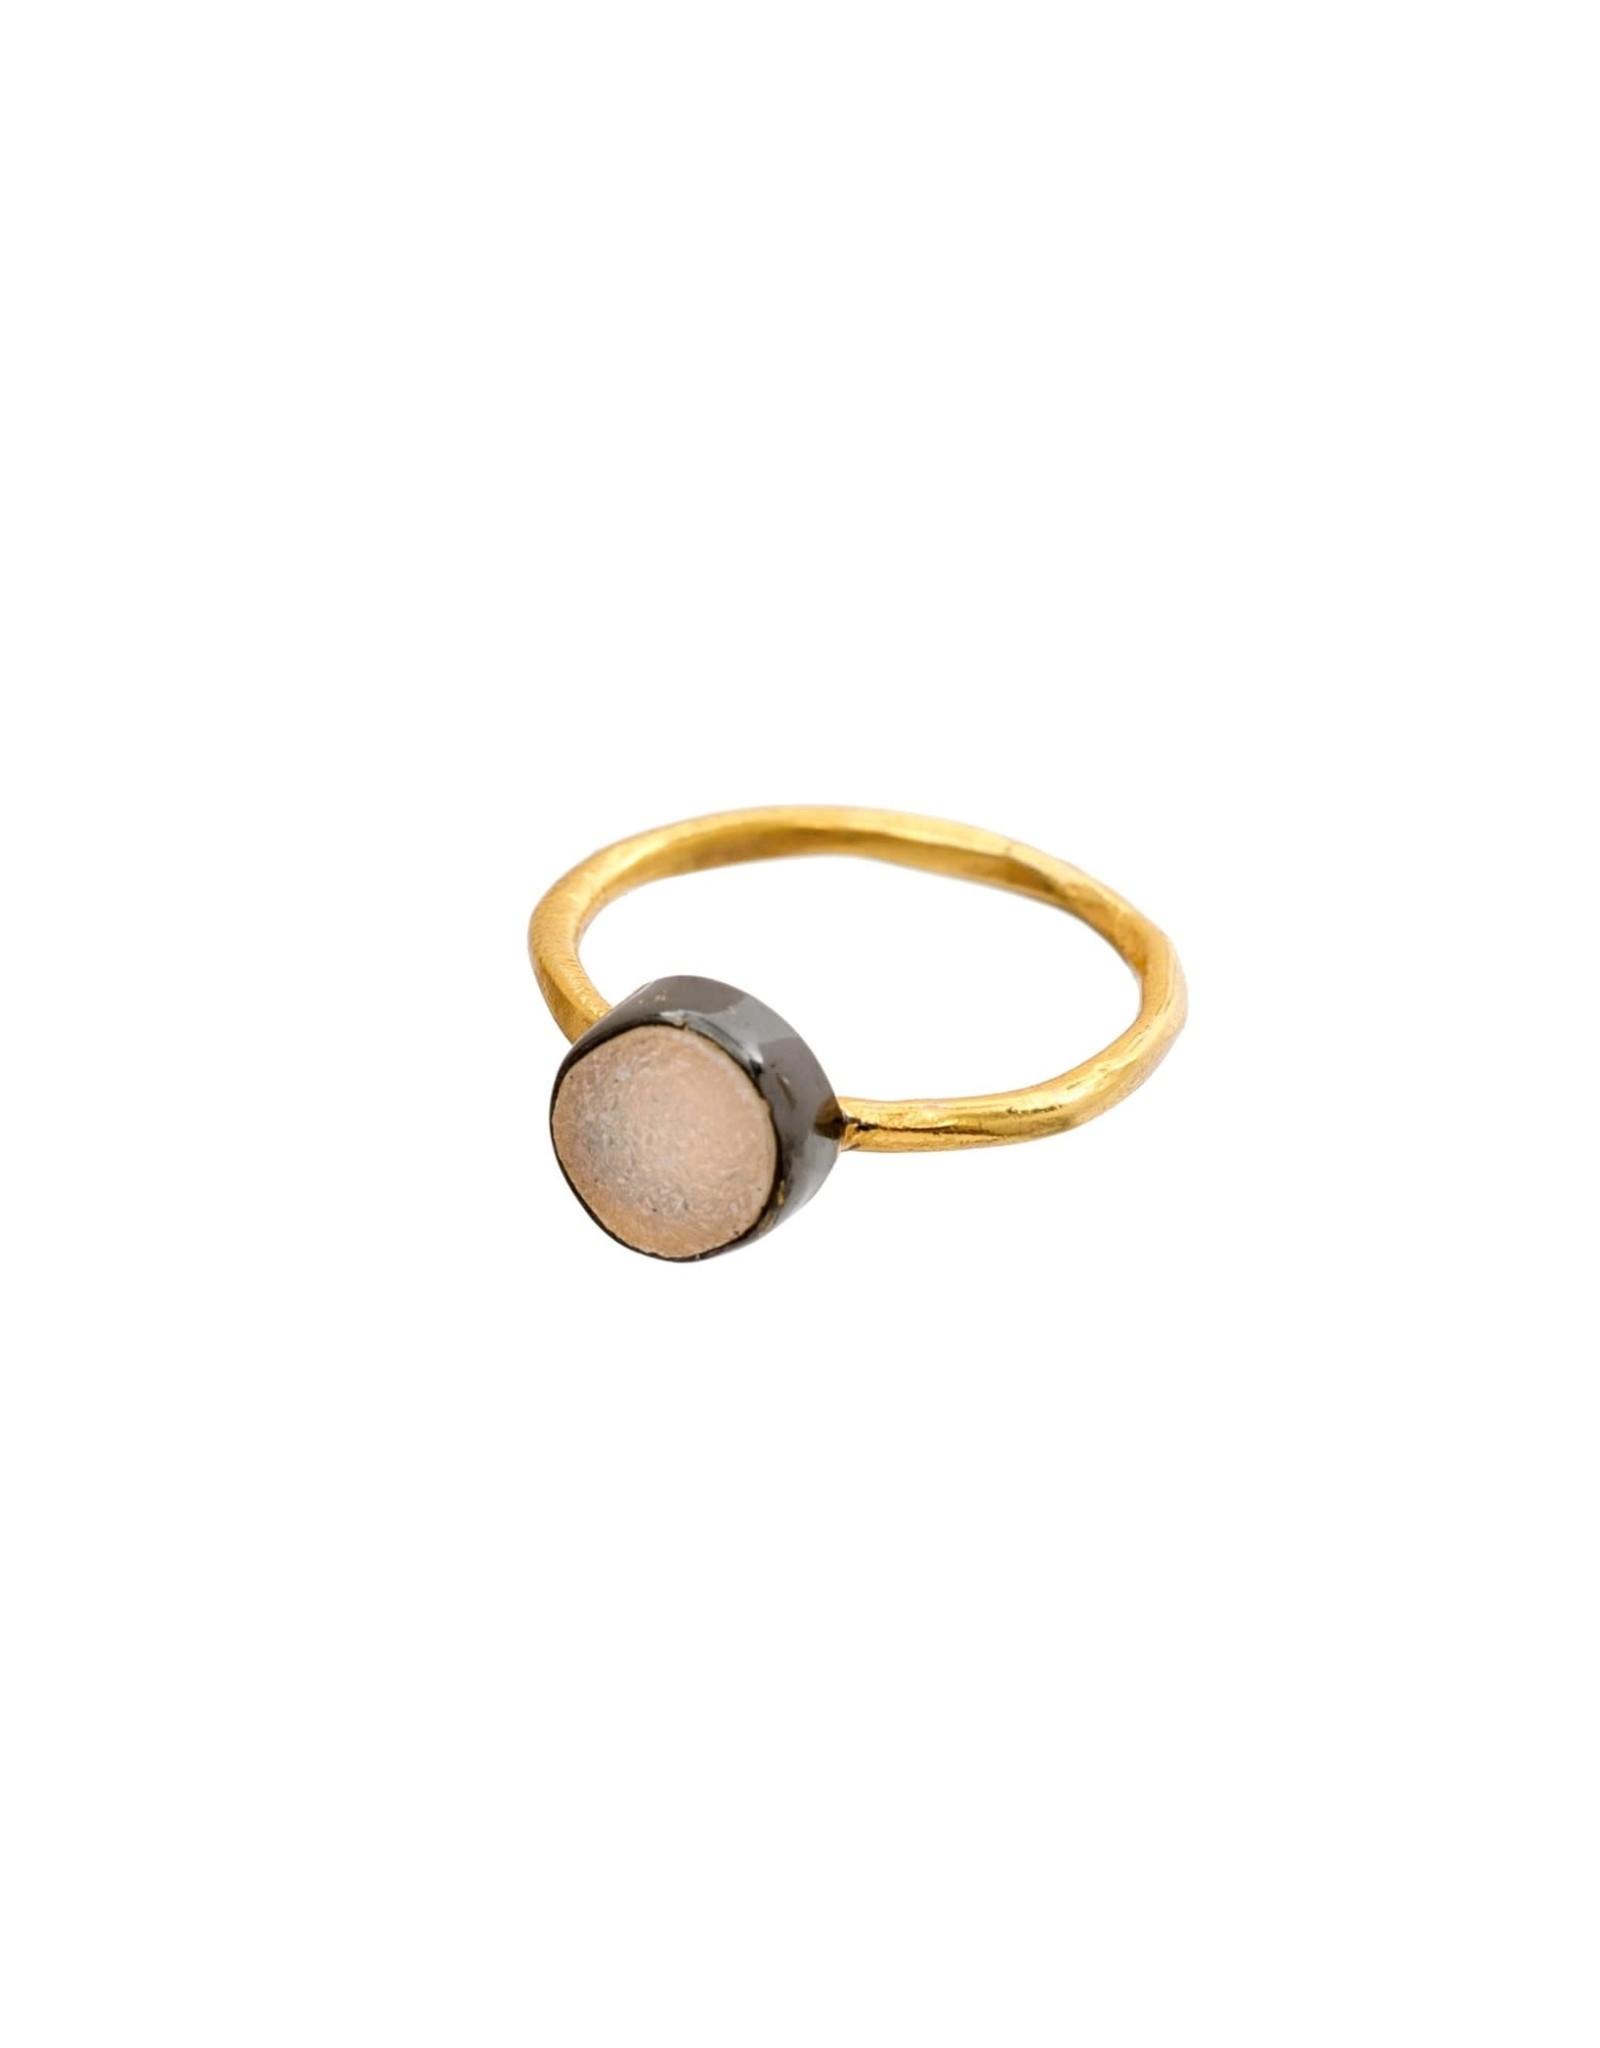 Stonegold Ring - White Druzy - 8